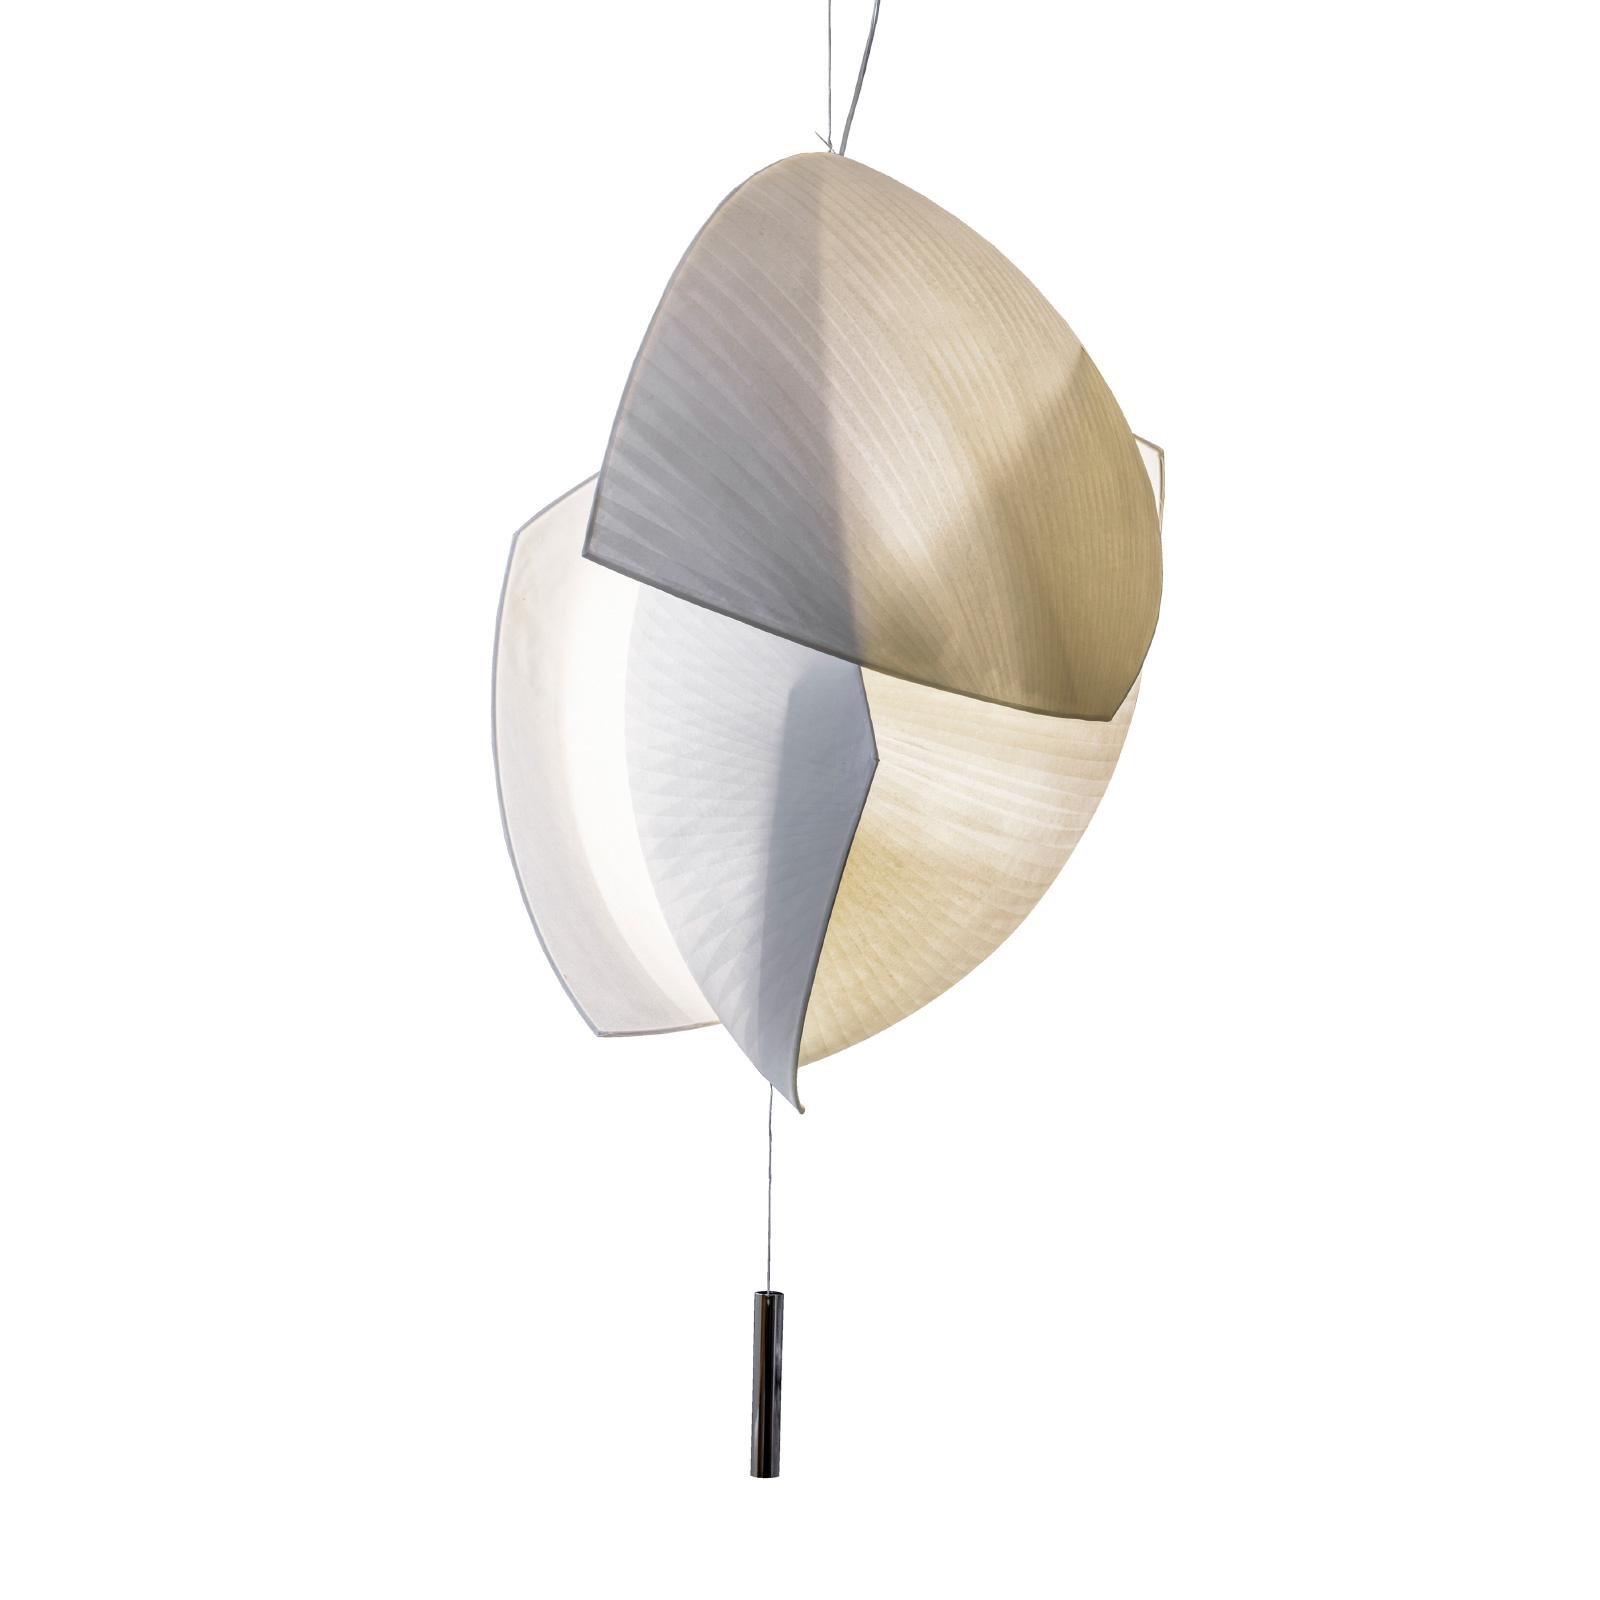 Grok Voiles lampa wisząca LED 95x70 cm, 1-10V